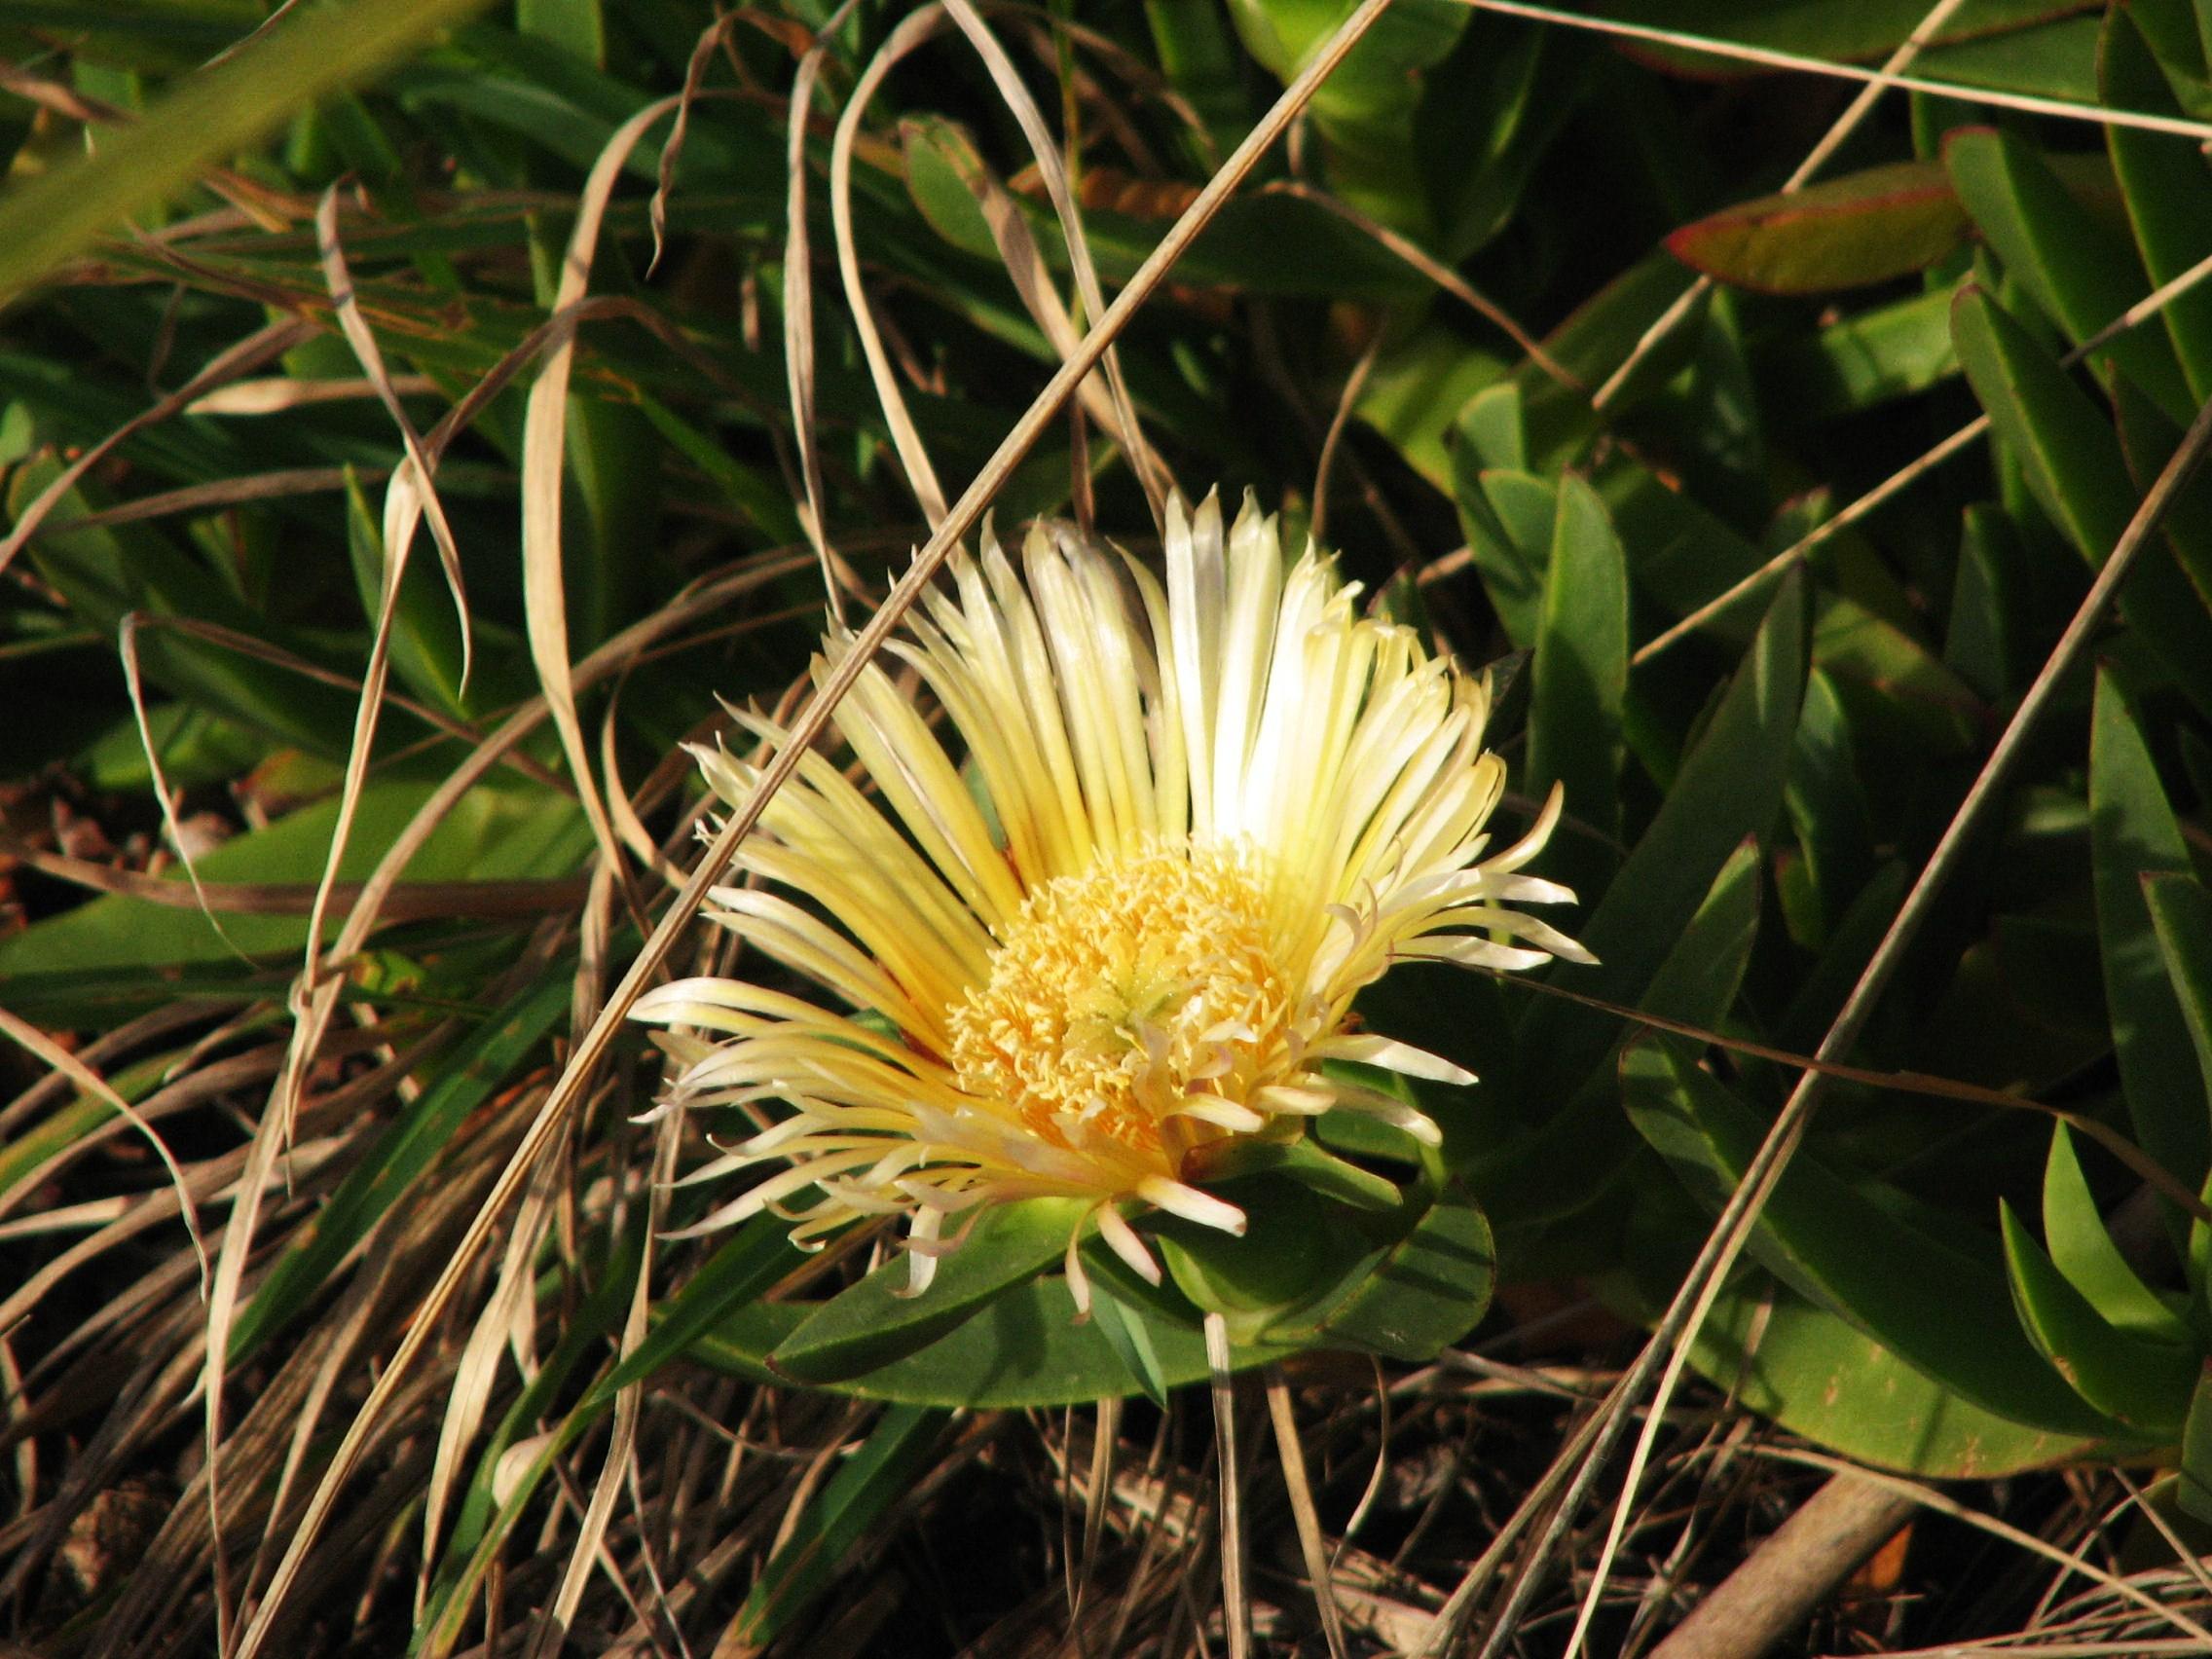 inletyellow ice daisy close-up